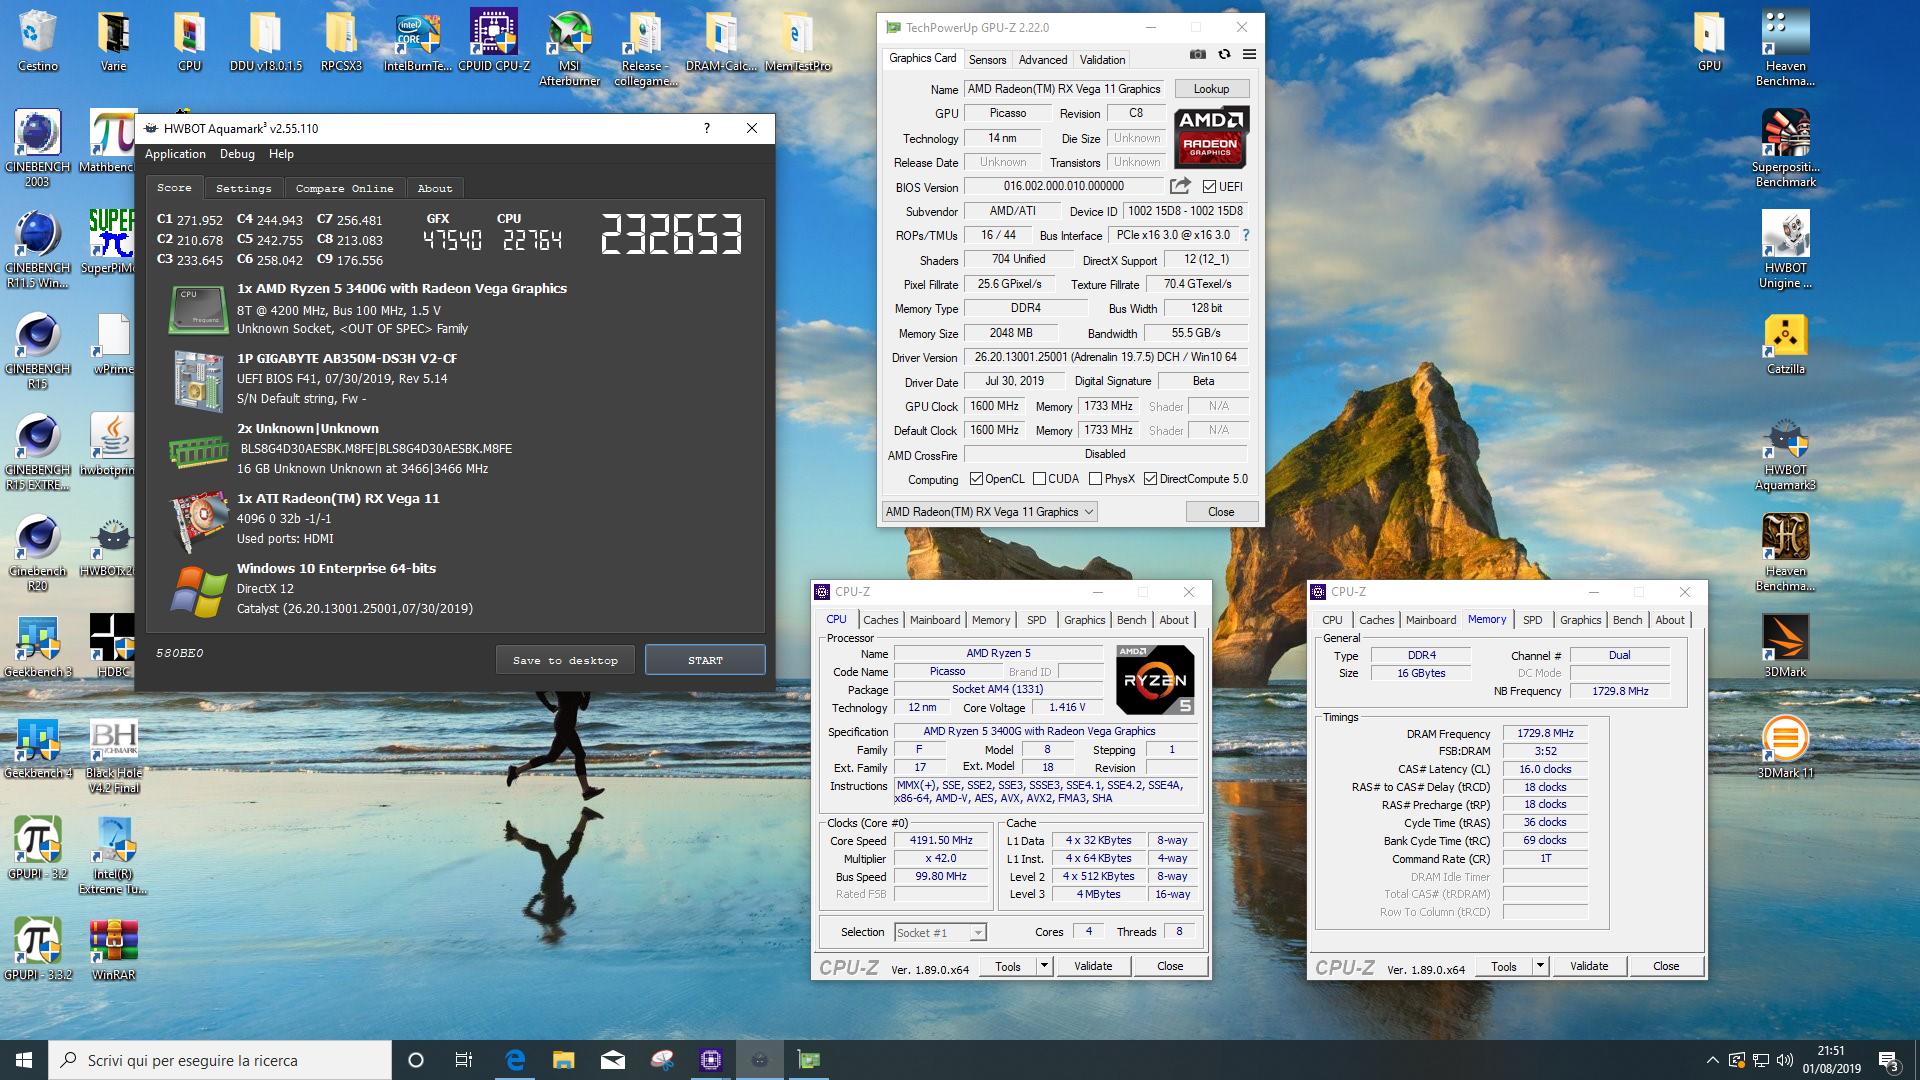 Ranieri92 S Aquamark Score 232653 Marks With A Radeon Rx Vega 11 Graphics Picasso